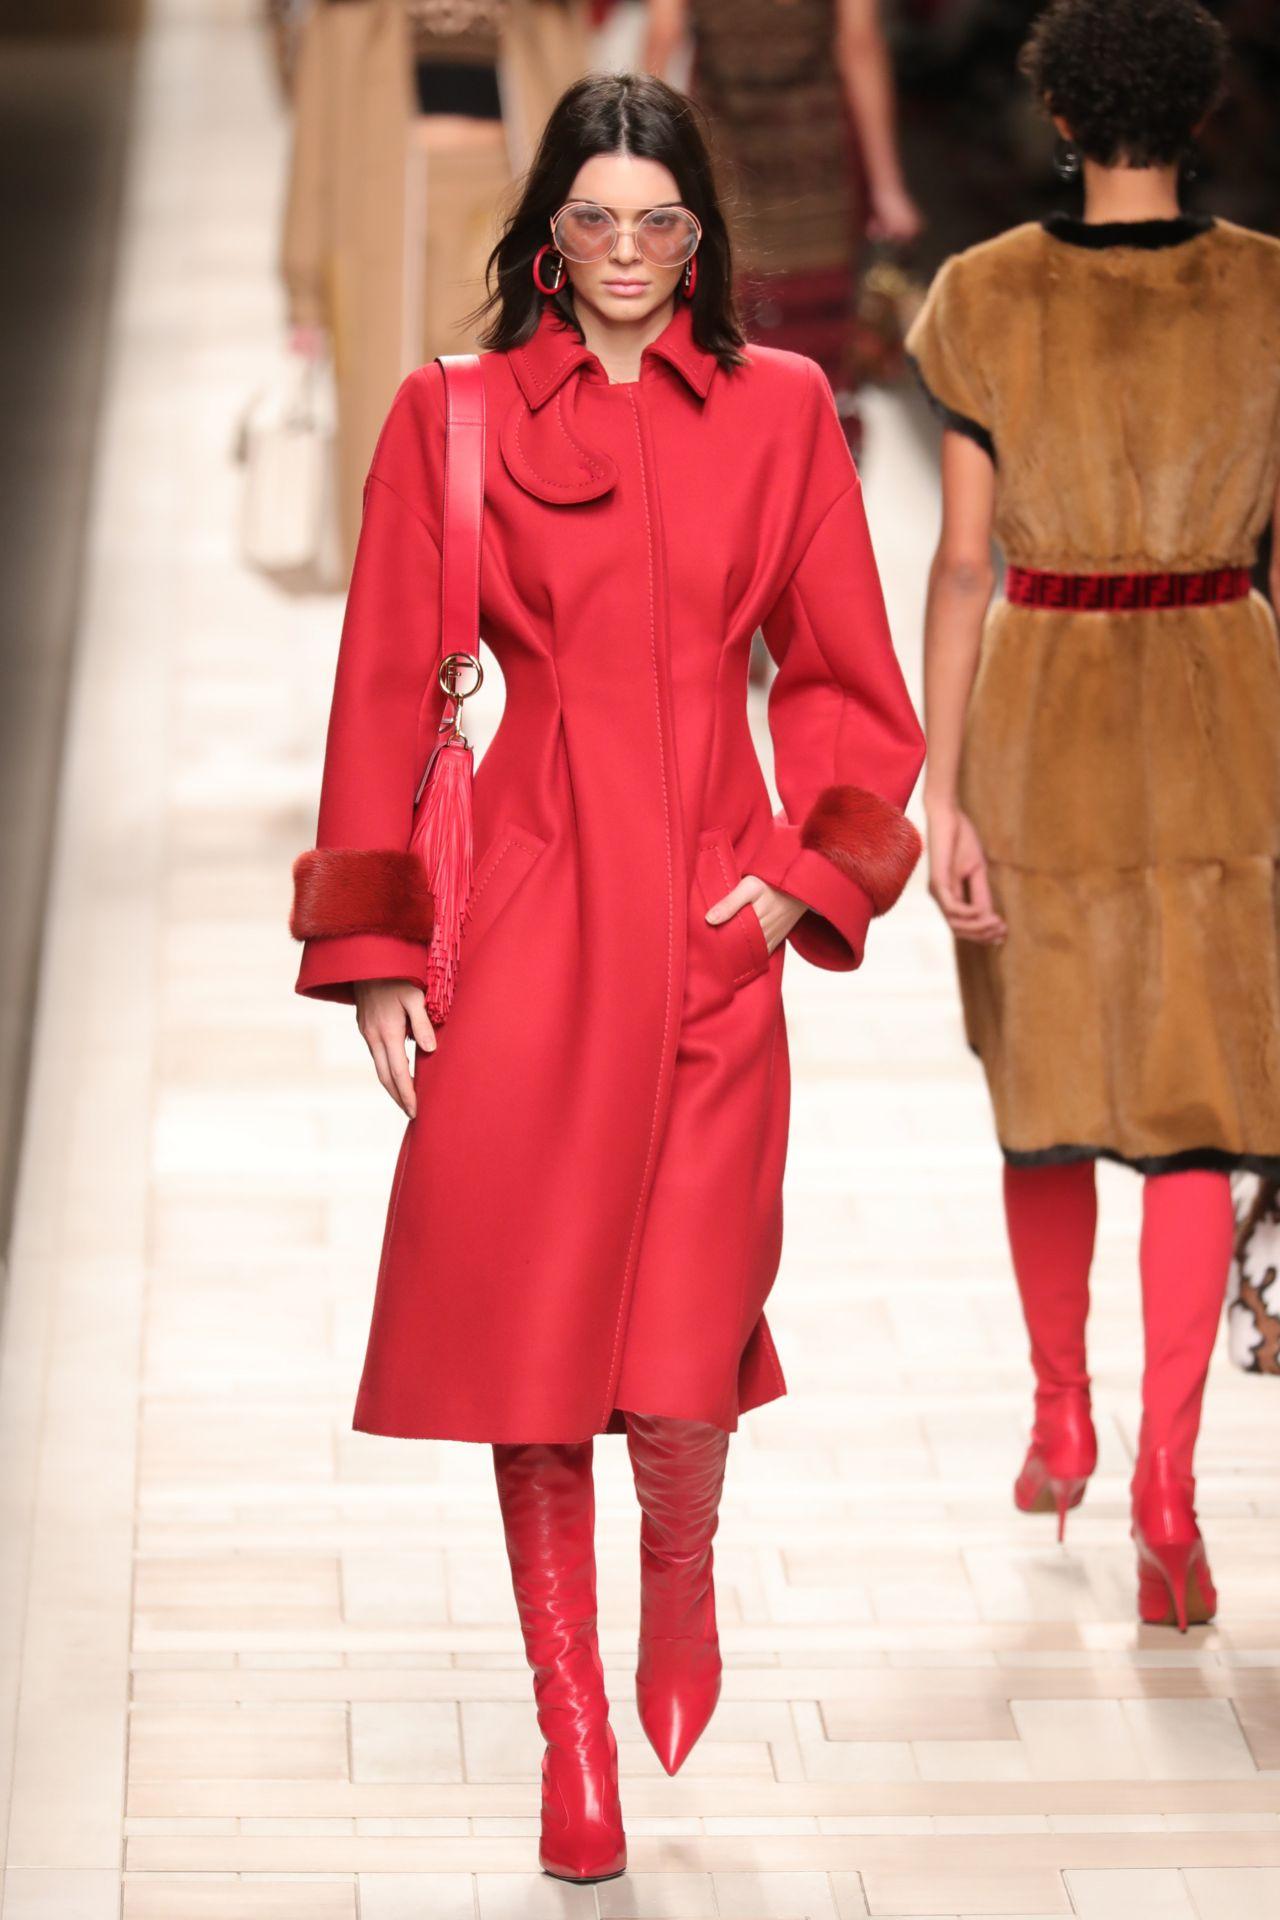 Kendall Jenner Supermodel Runway Walk At Milan Fashion